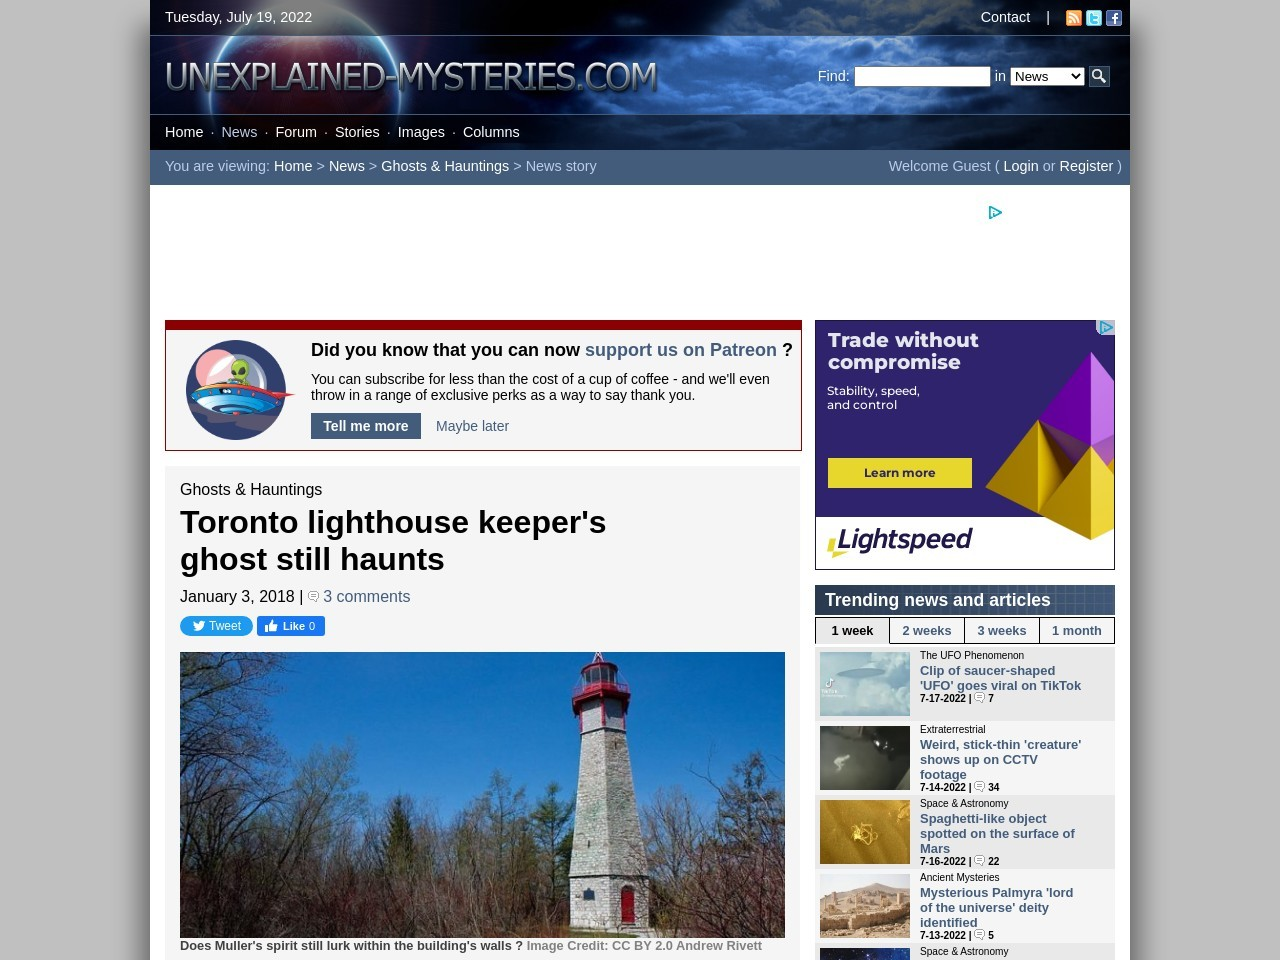 Toronto lighthouse keeper's ghost still haunts